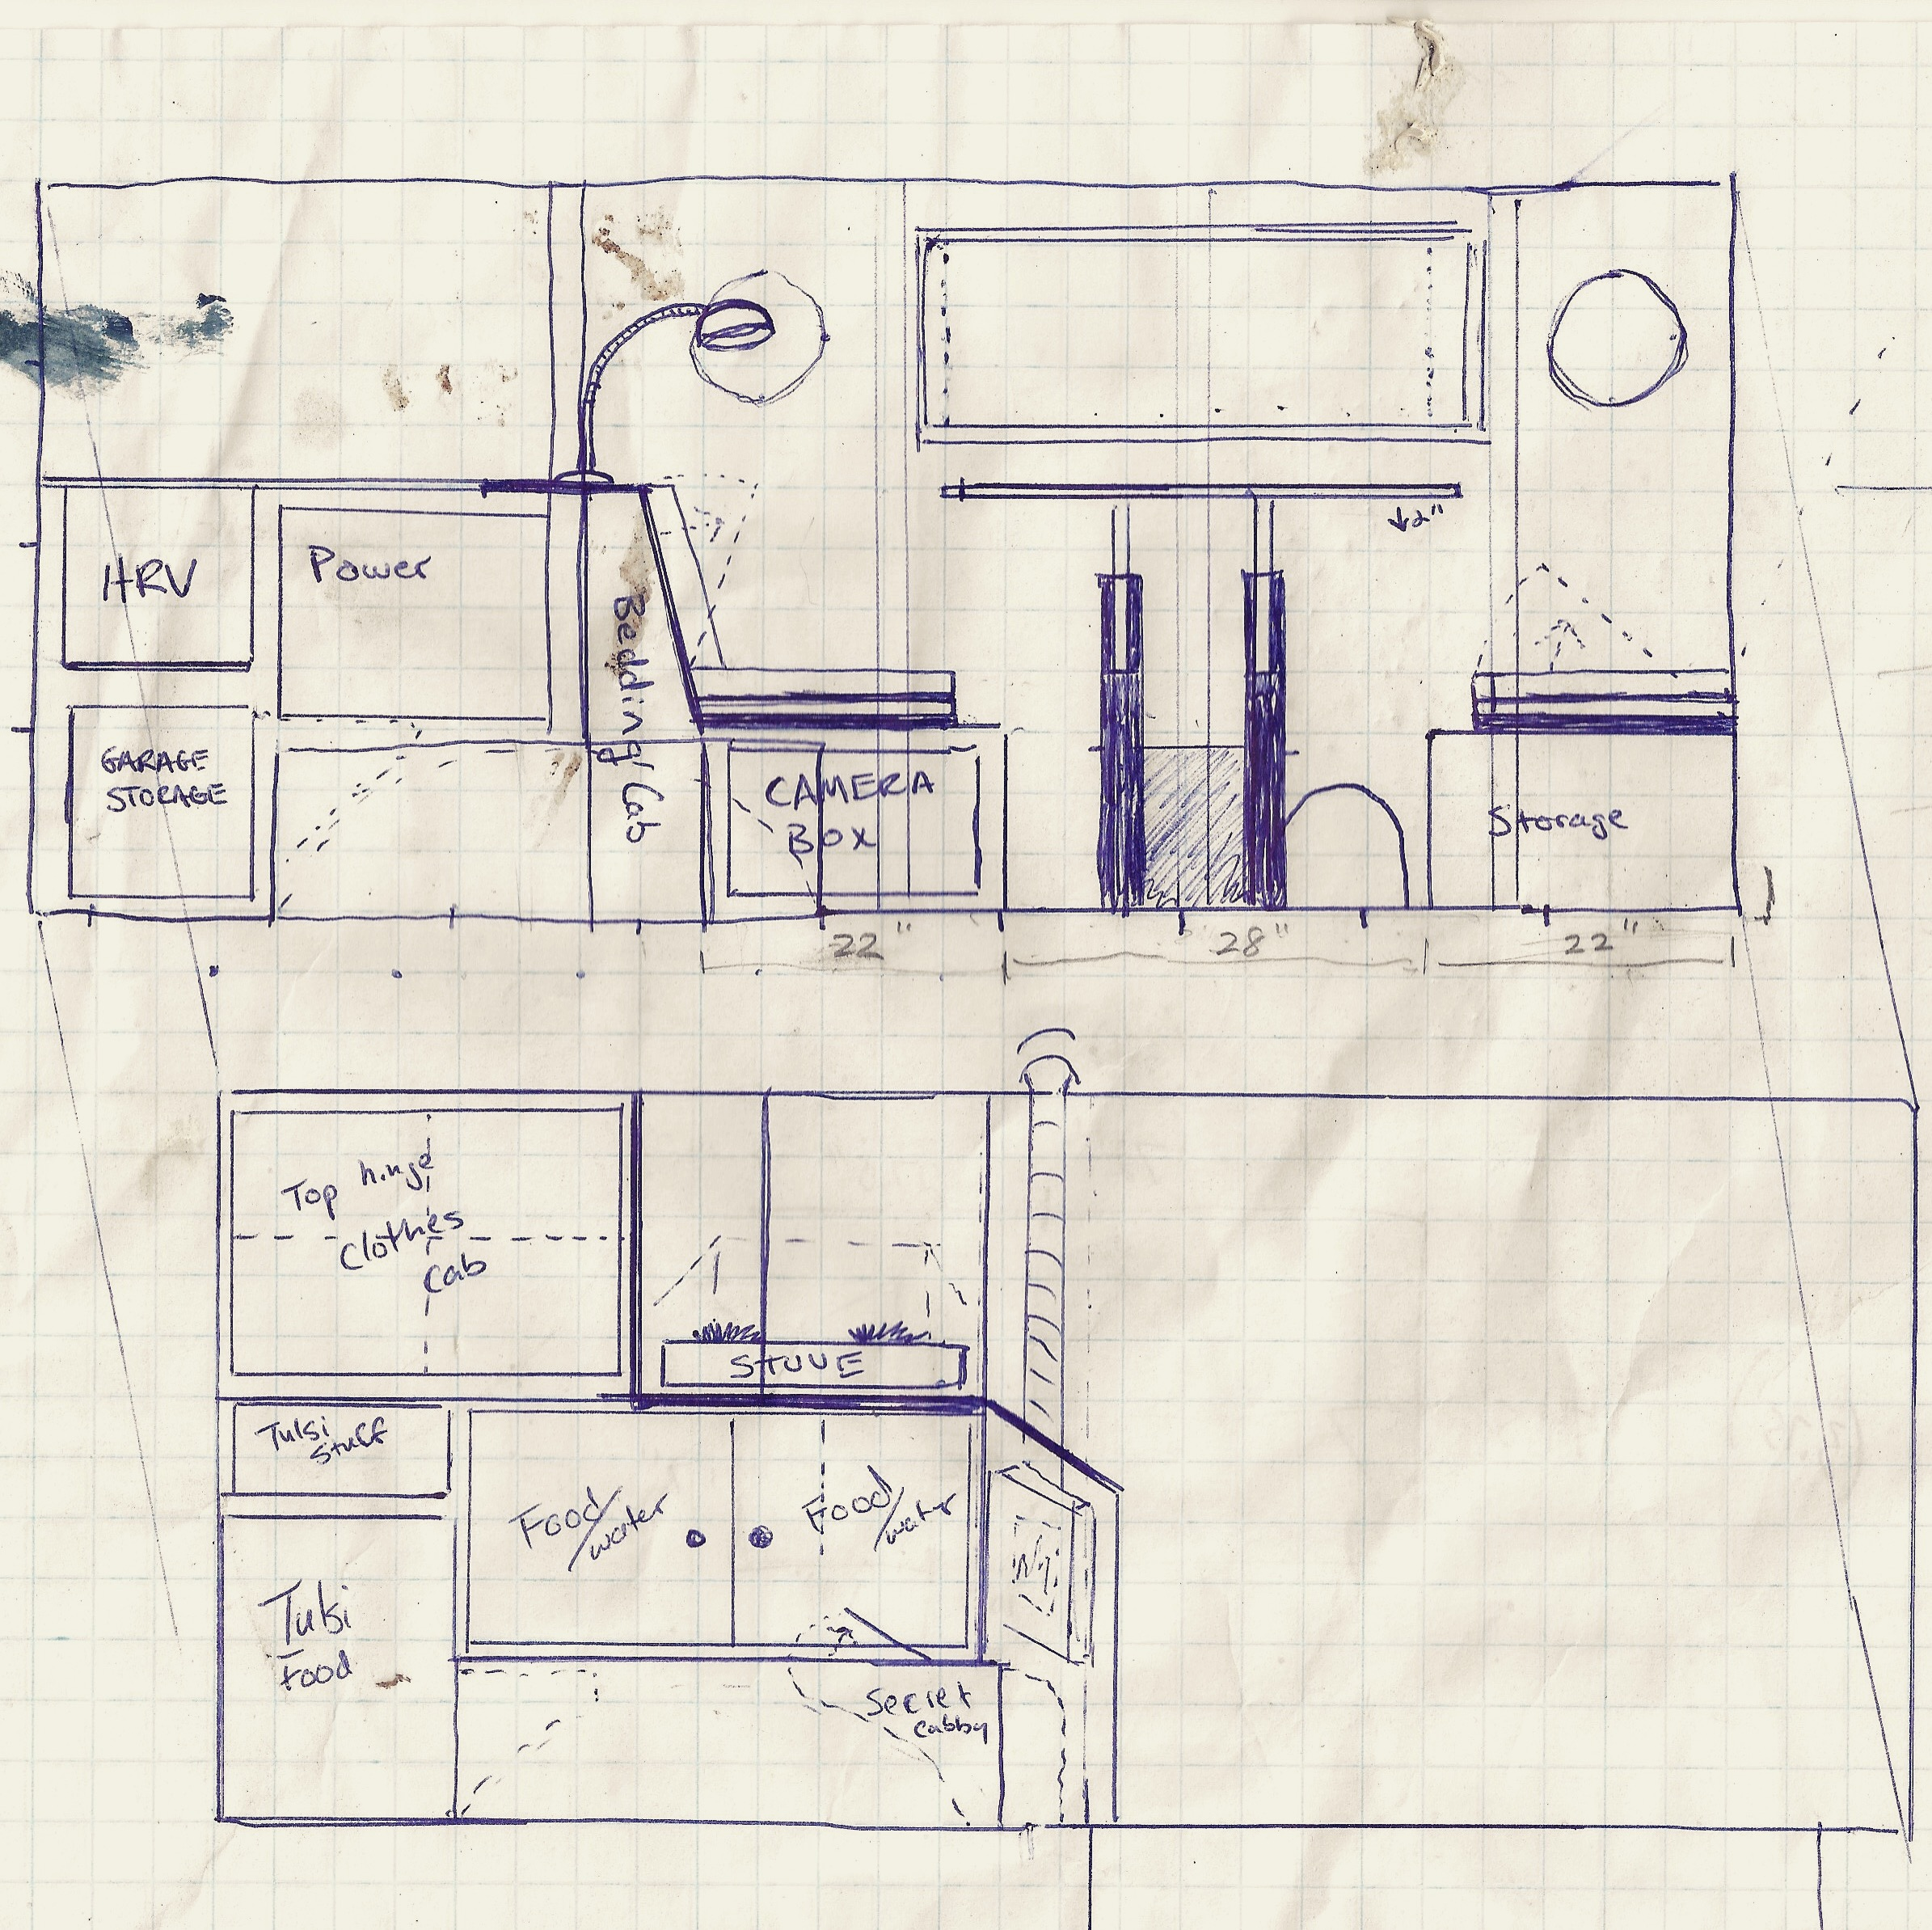 Vitruvian Van Sketches of The Original Layout